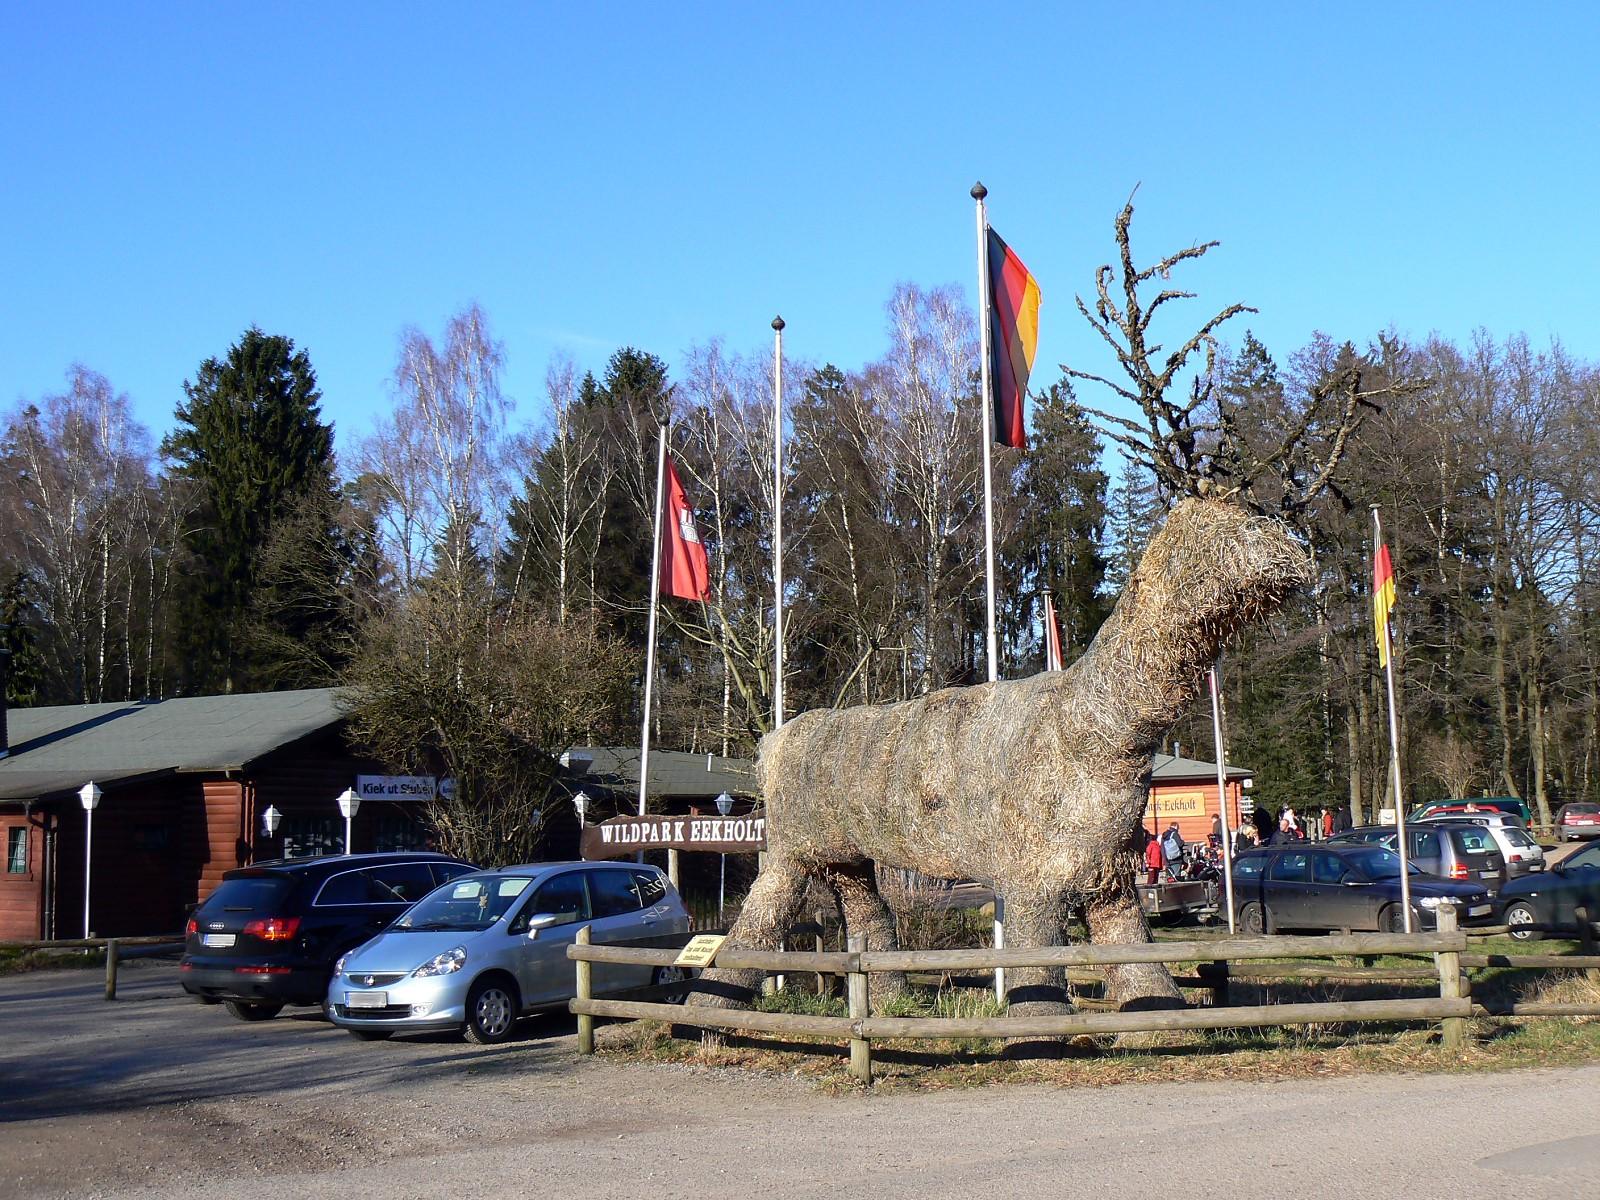 Wildpark Eekholt